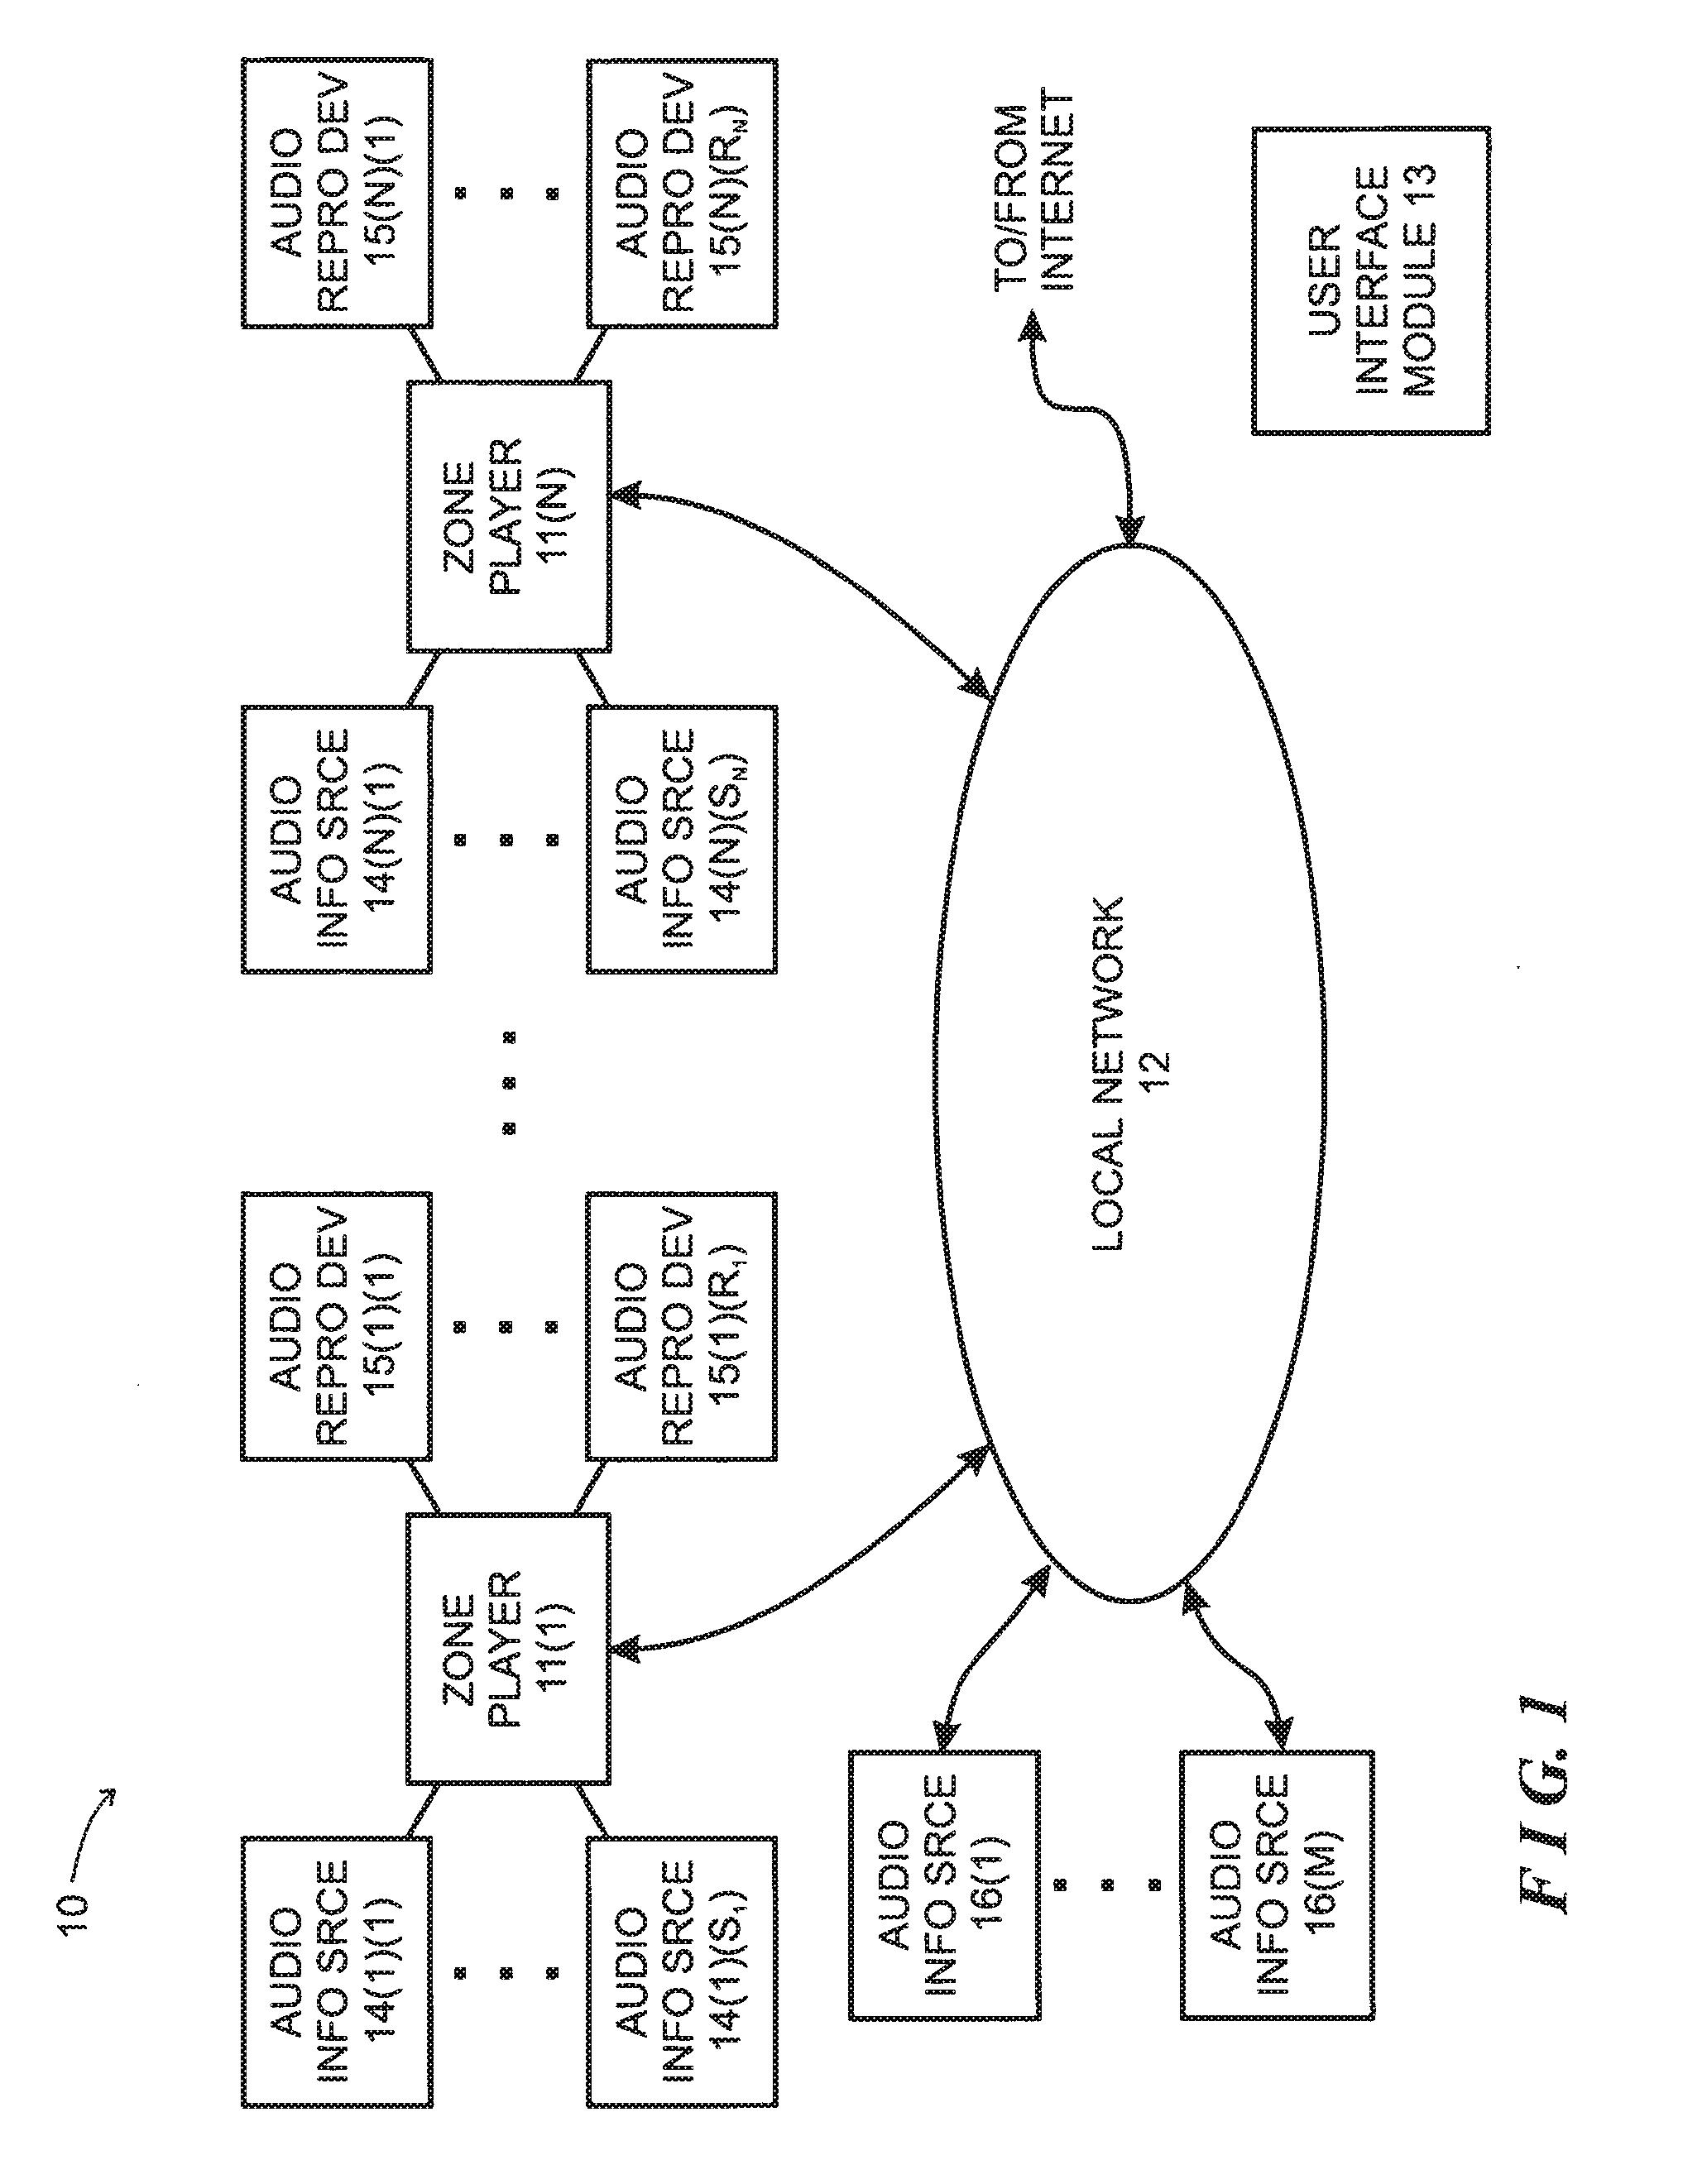 Active Passive Bass Guitar Wiring Diagram Wiring Diagrams Darren